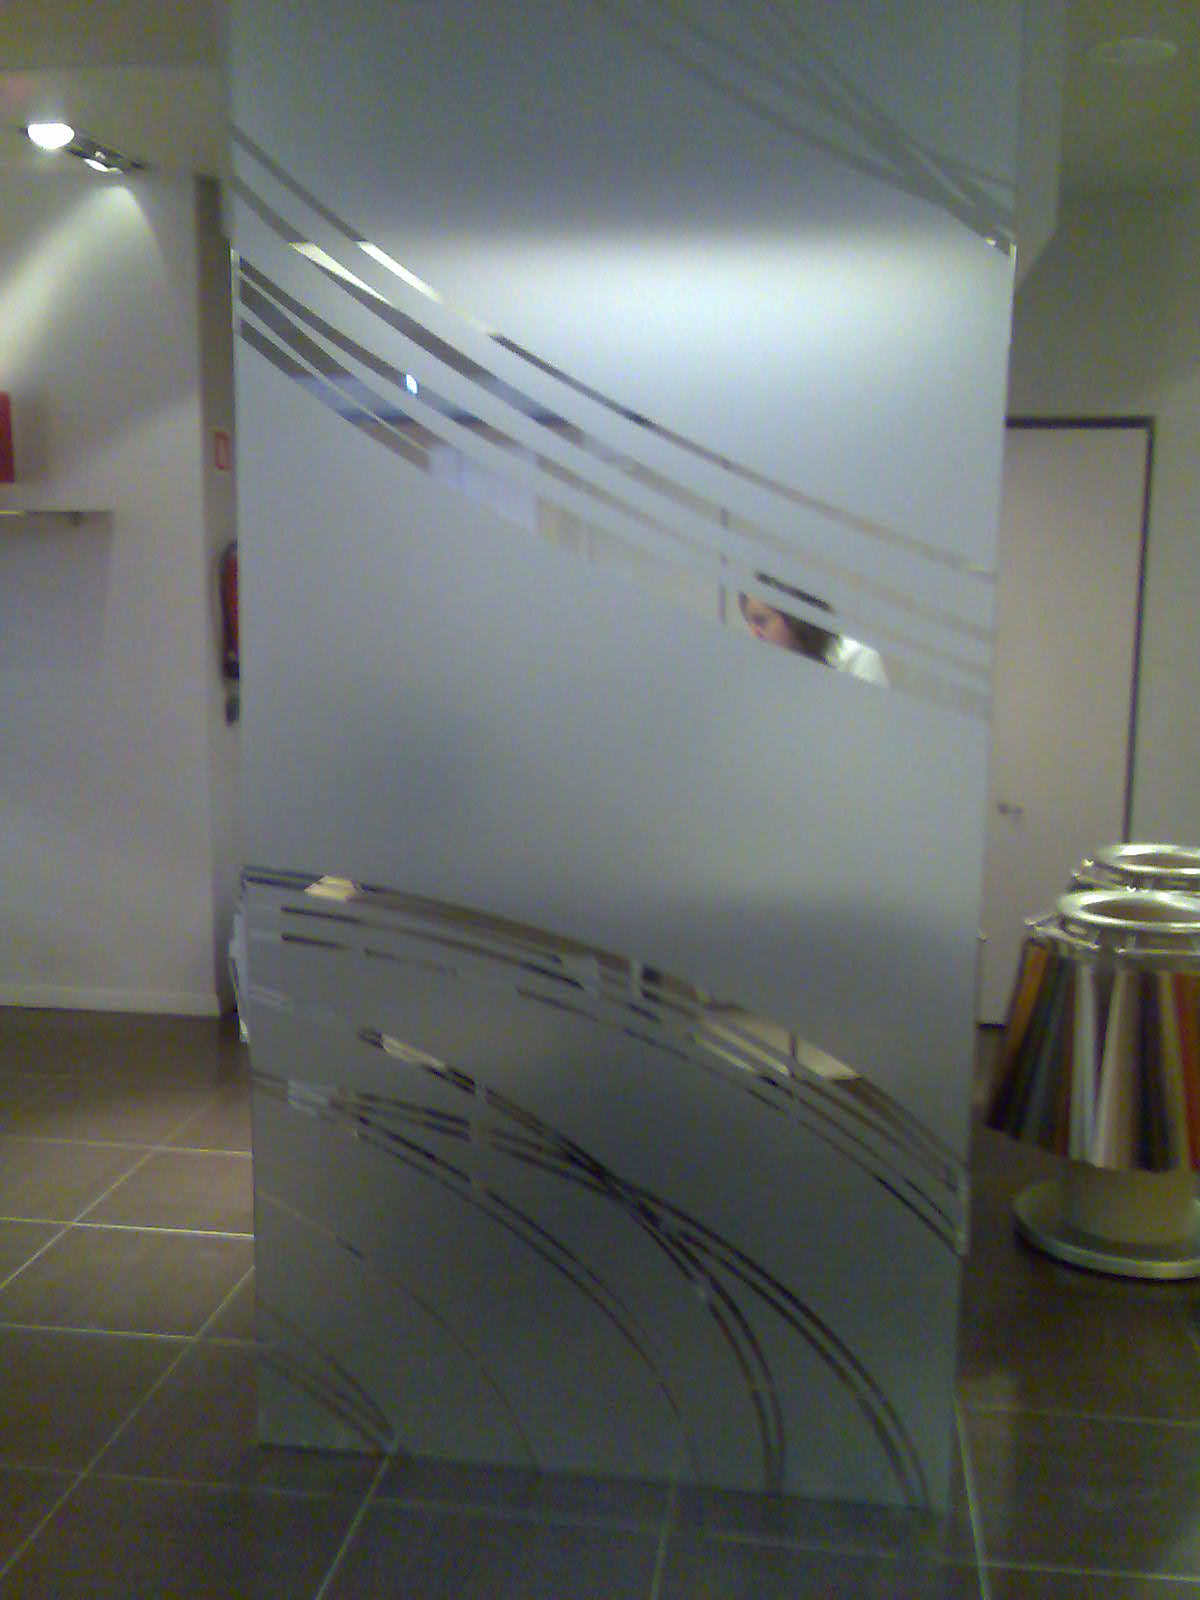 Cristaleria galatzo vidrio templado decorado for Vidrios decorados para puertas interiores